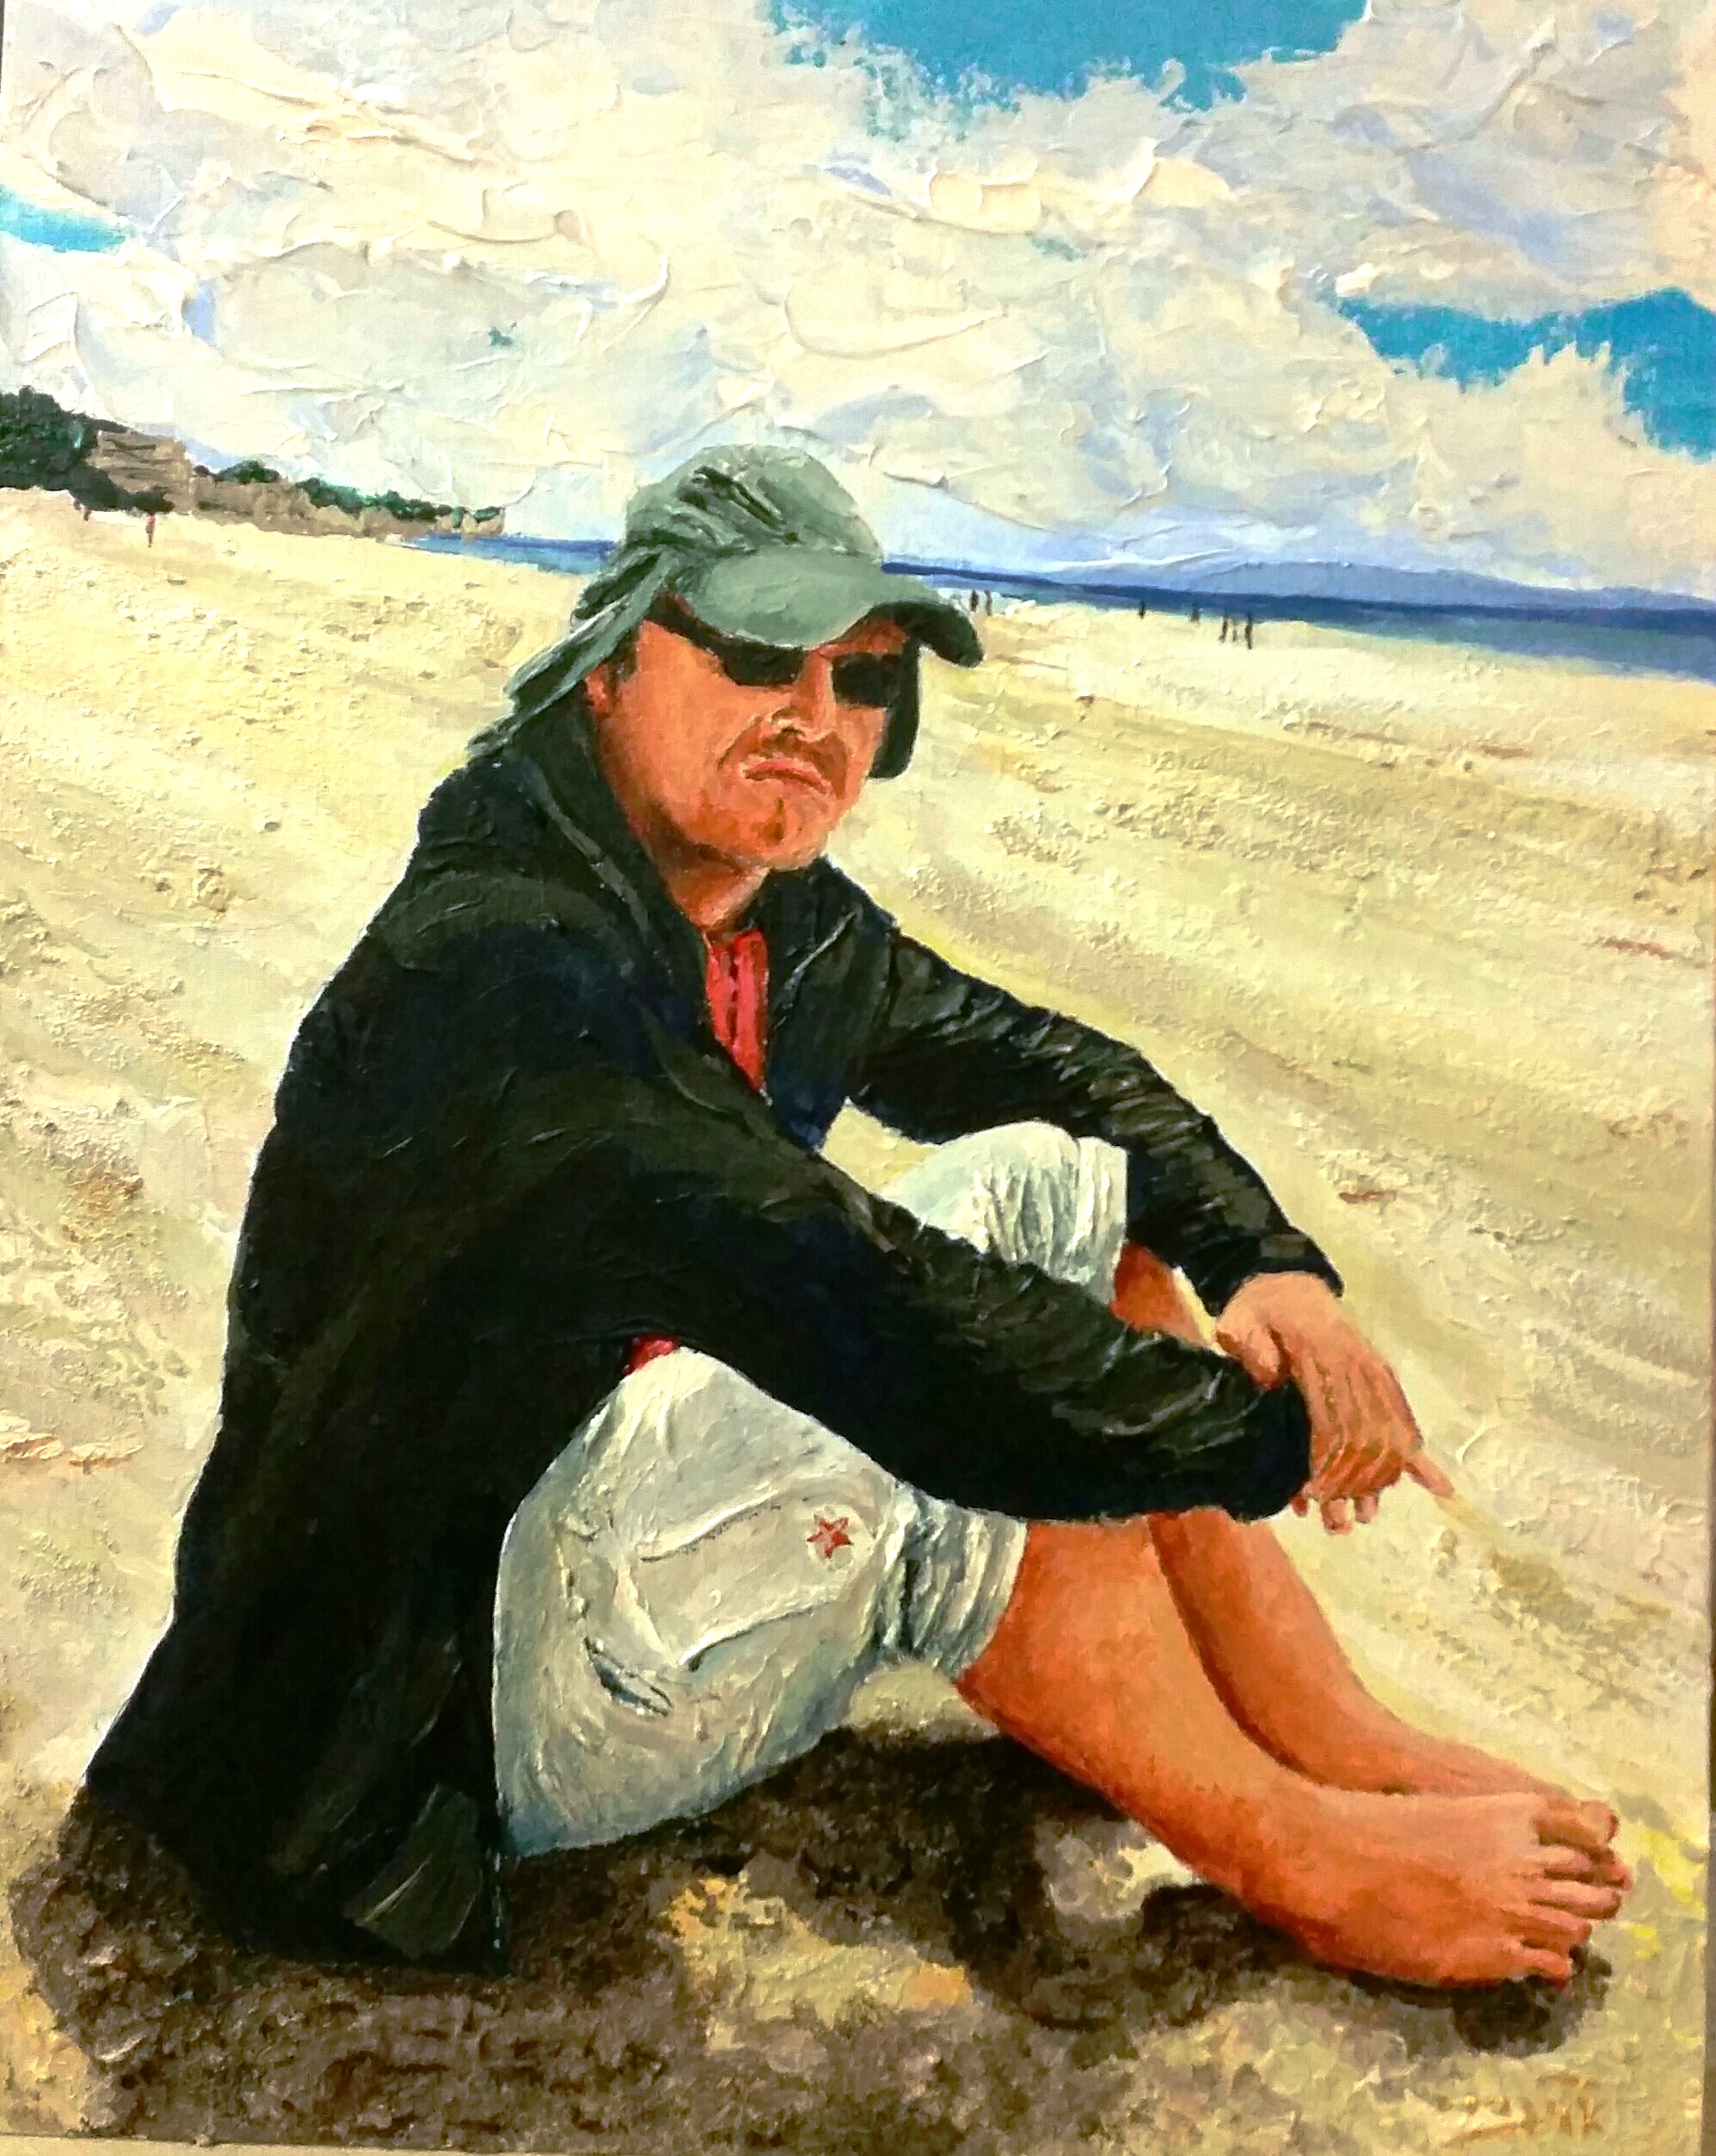 Shores are sometimes longings (Zvi)